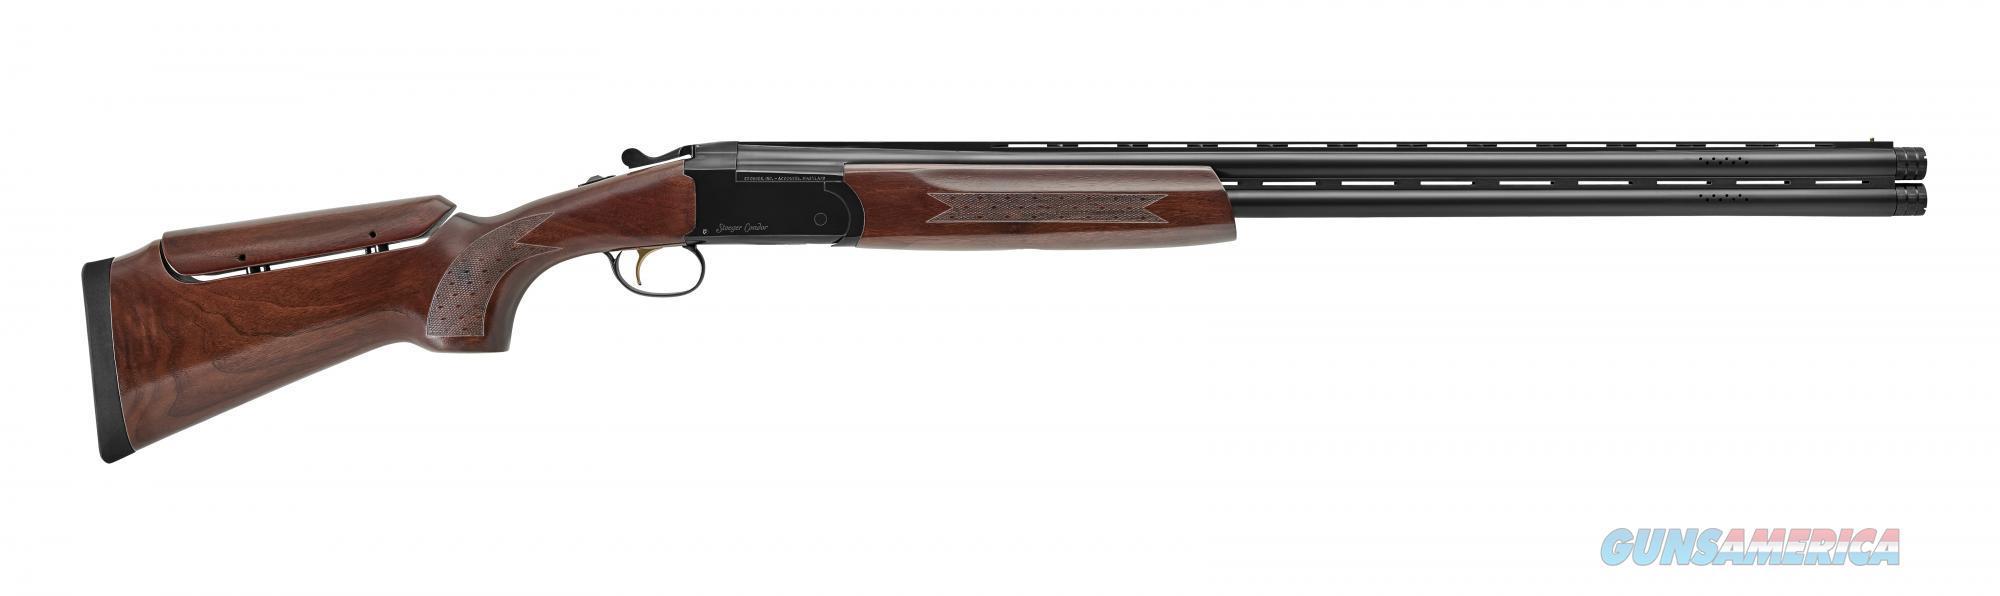 Stoeger Condor Competition (31045)  Guns > Shotguns > Stoeger Shotguns